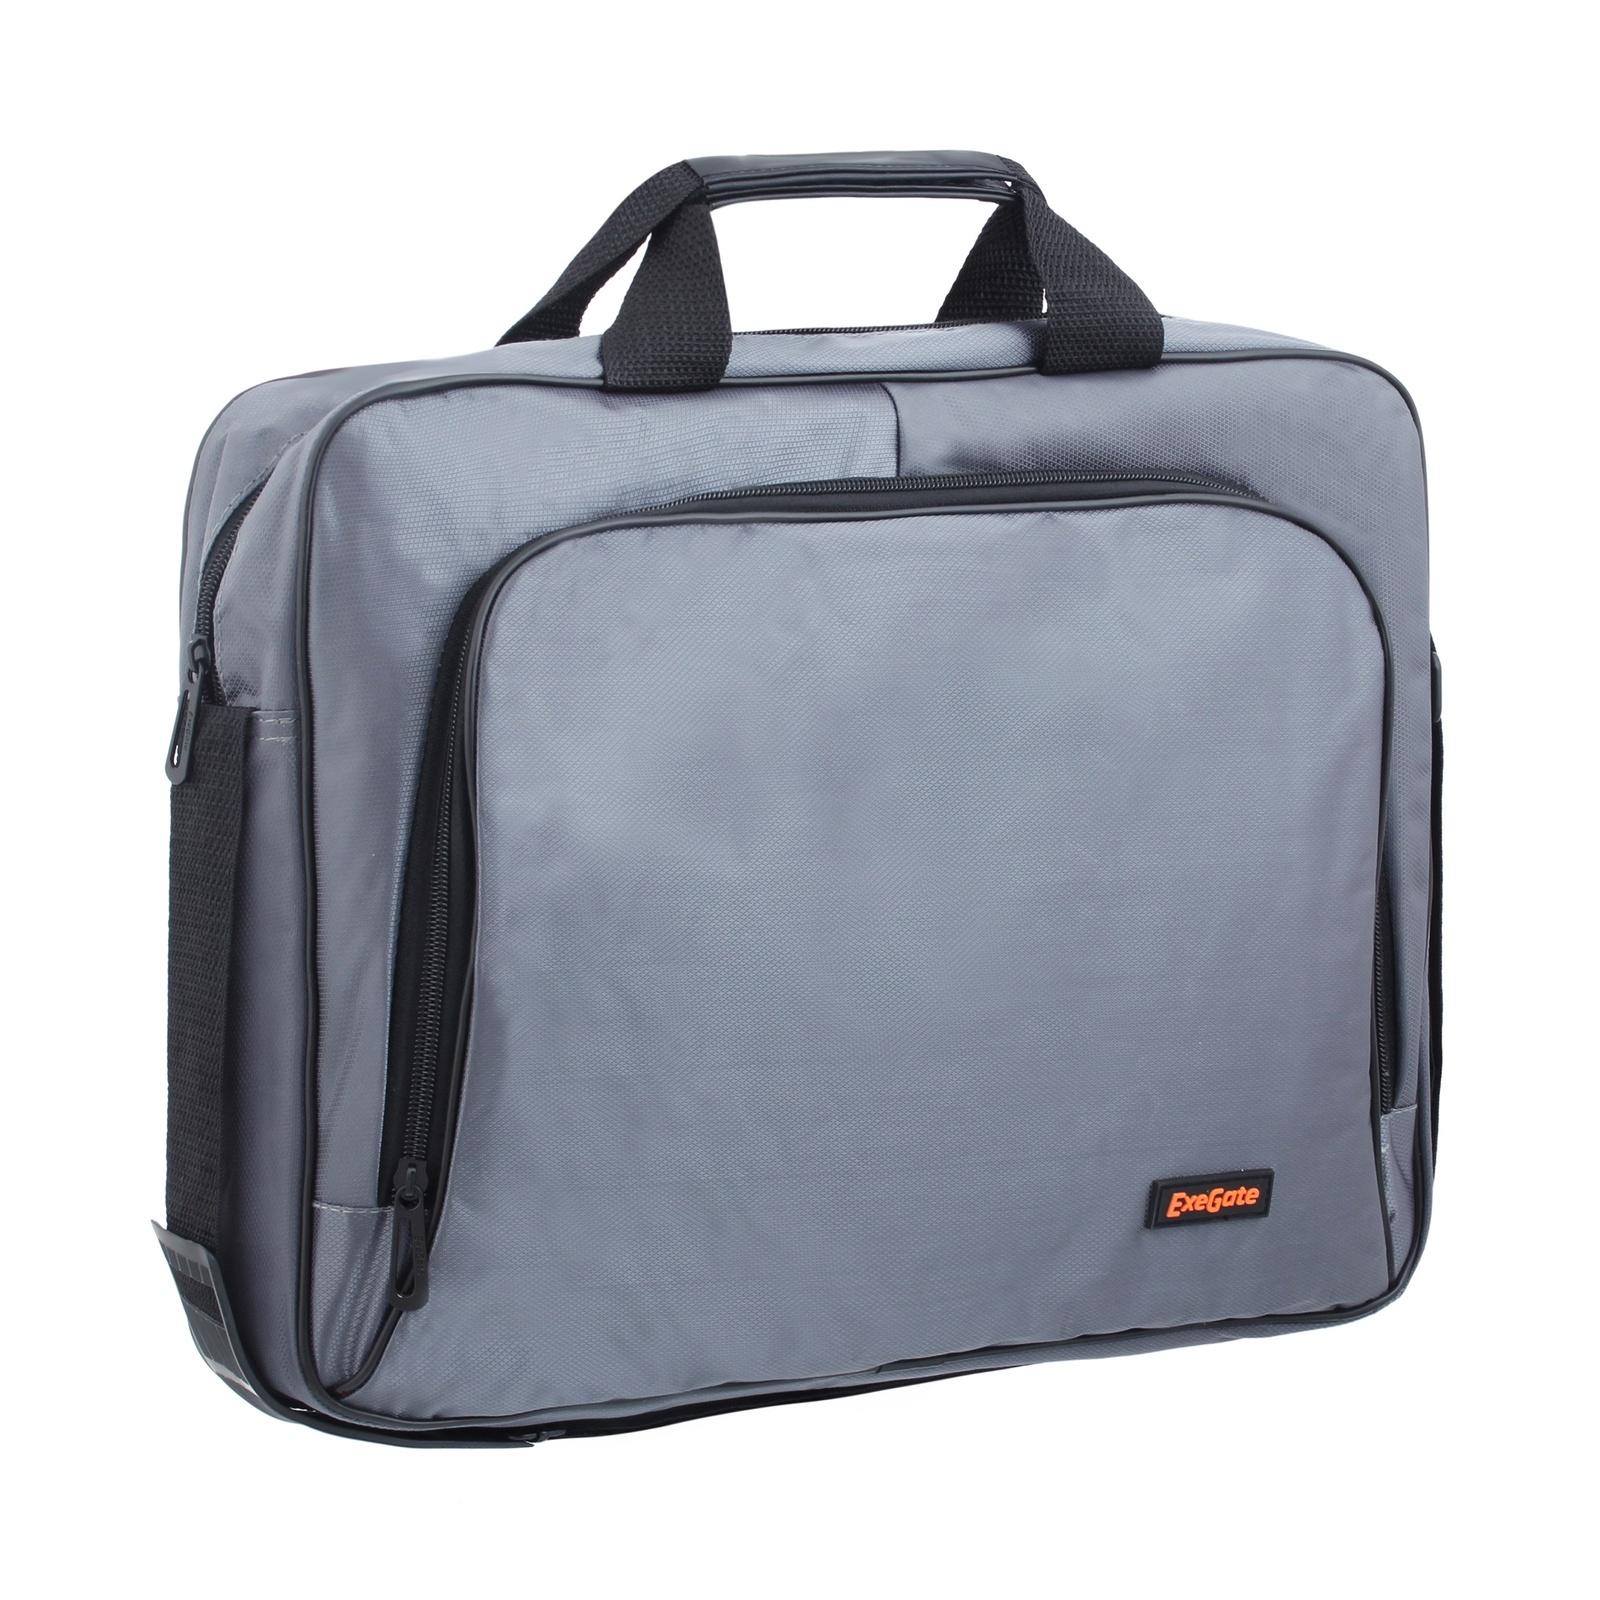 Сумка Exegate Office F1596 Dark-Grey, темно-серая, полиэстер, для ноутбуков до 15.6 аксессуар сумка 15 6 exegate office f1595 black